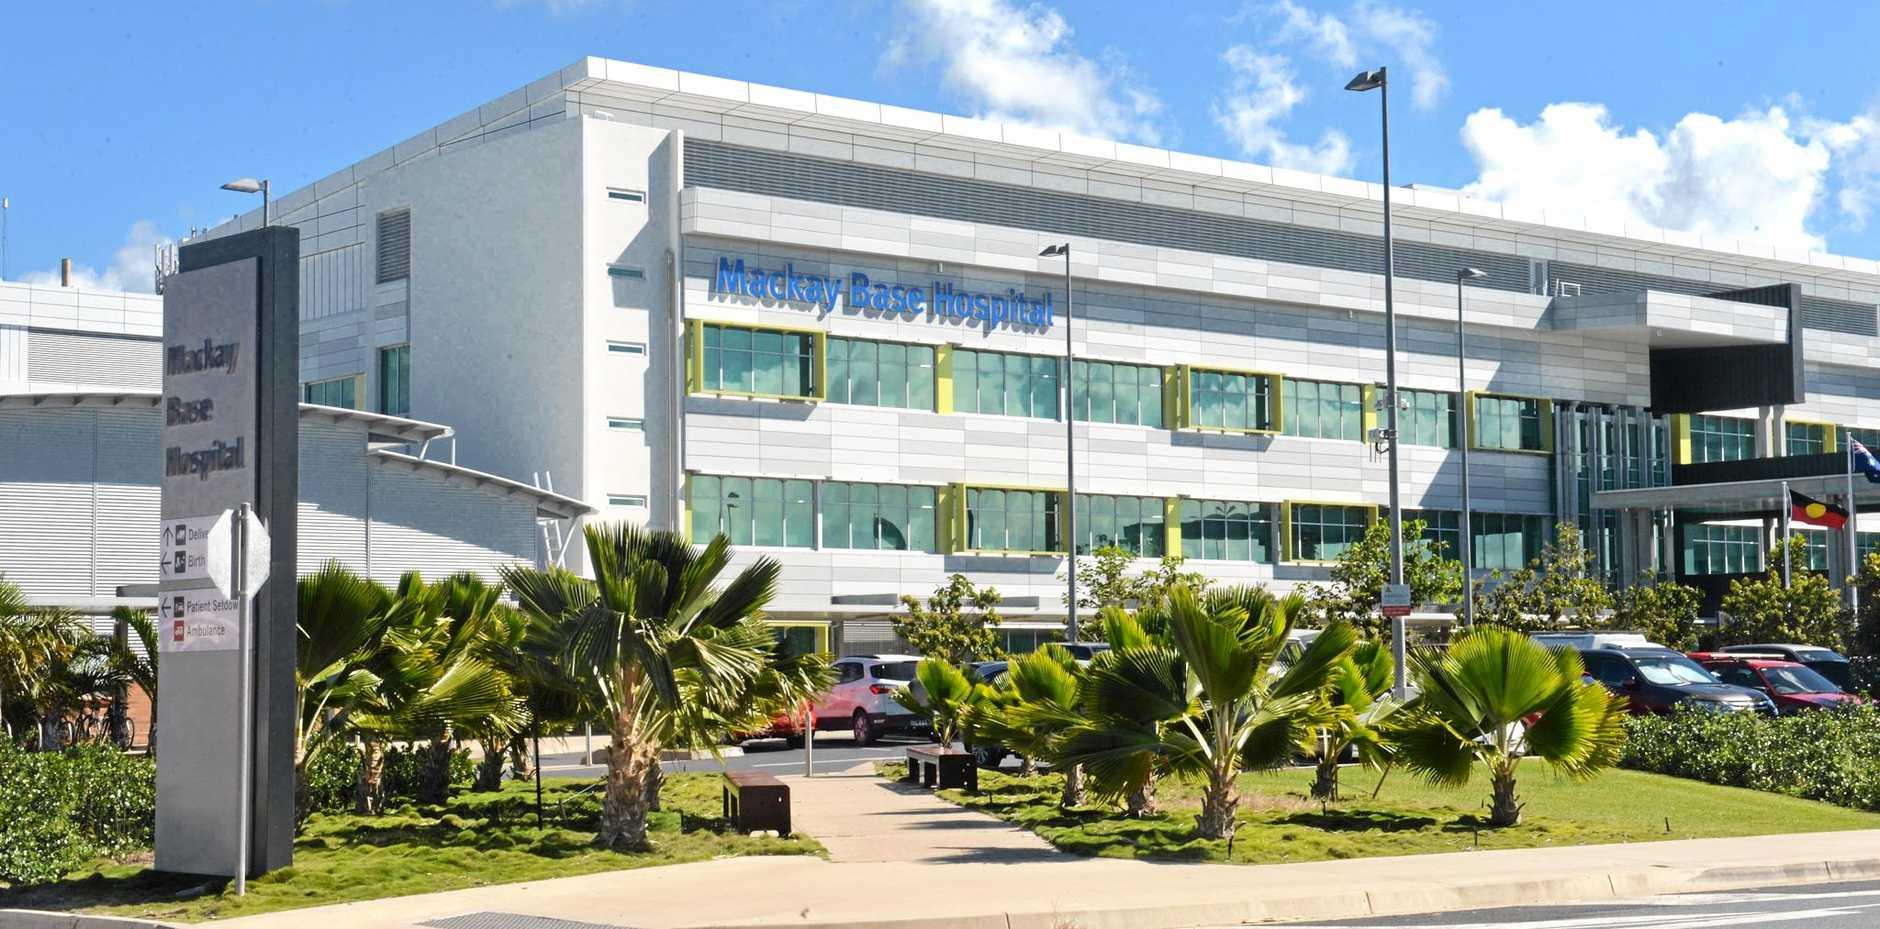 SHORTER QUEUES: Mackay Base Hospital has cut its waitng times for operations.